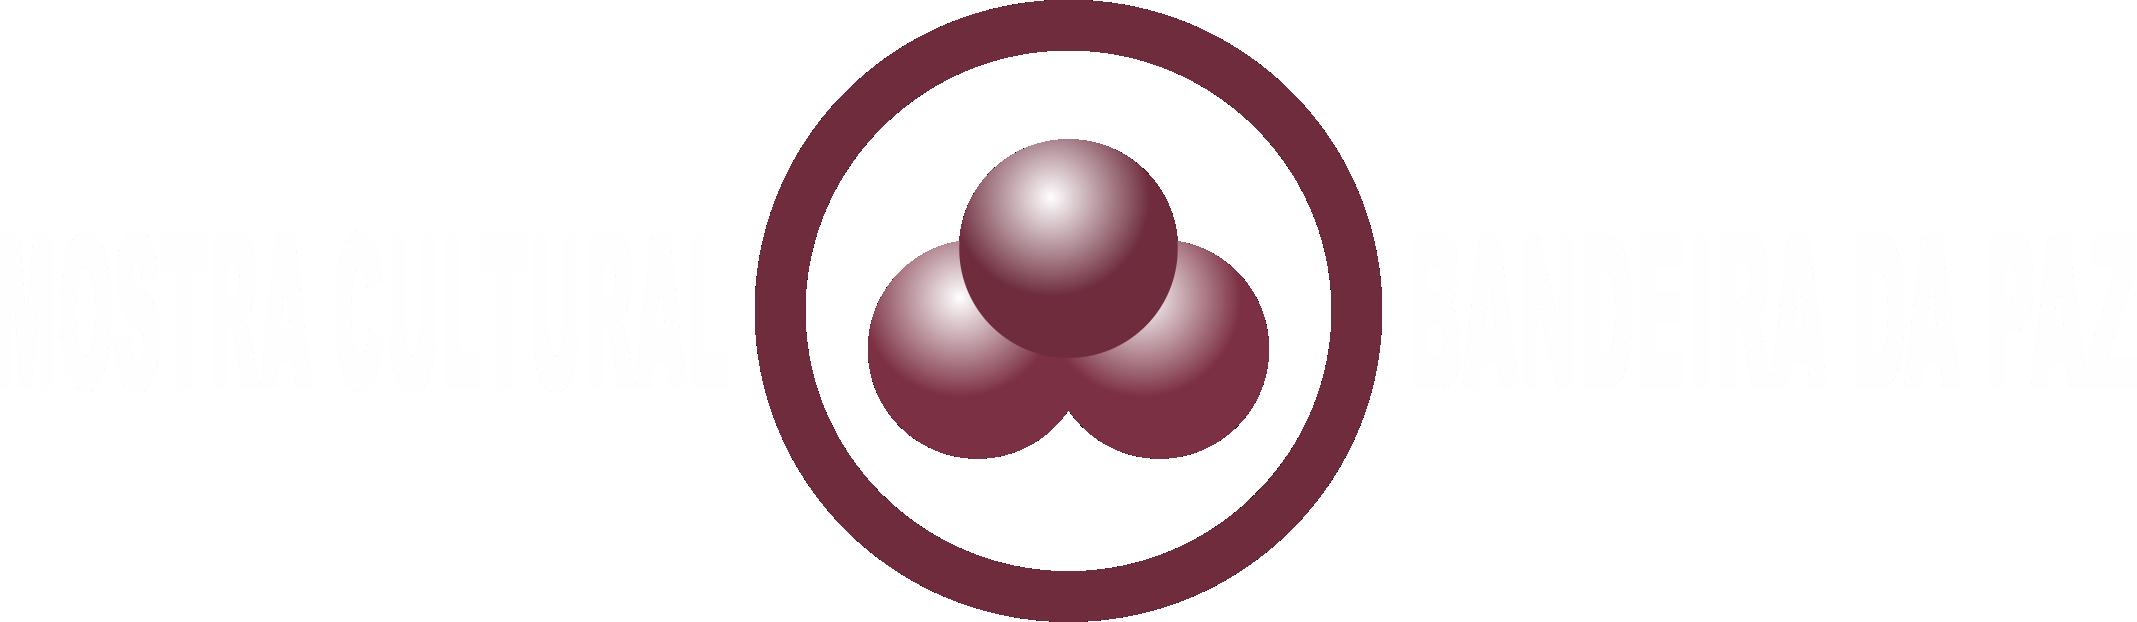 Logo Bnadeira da Paz 2021_1 branco